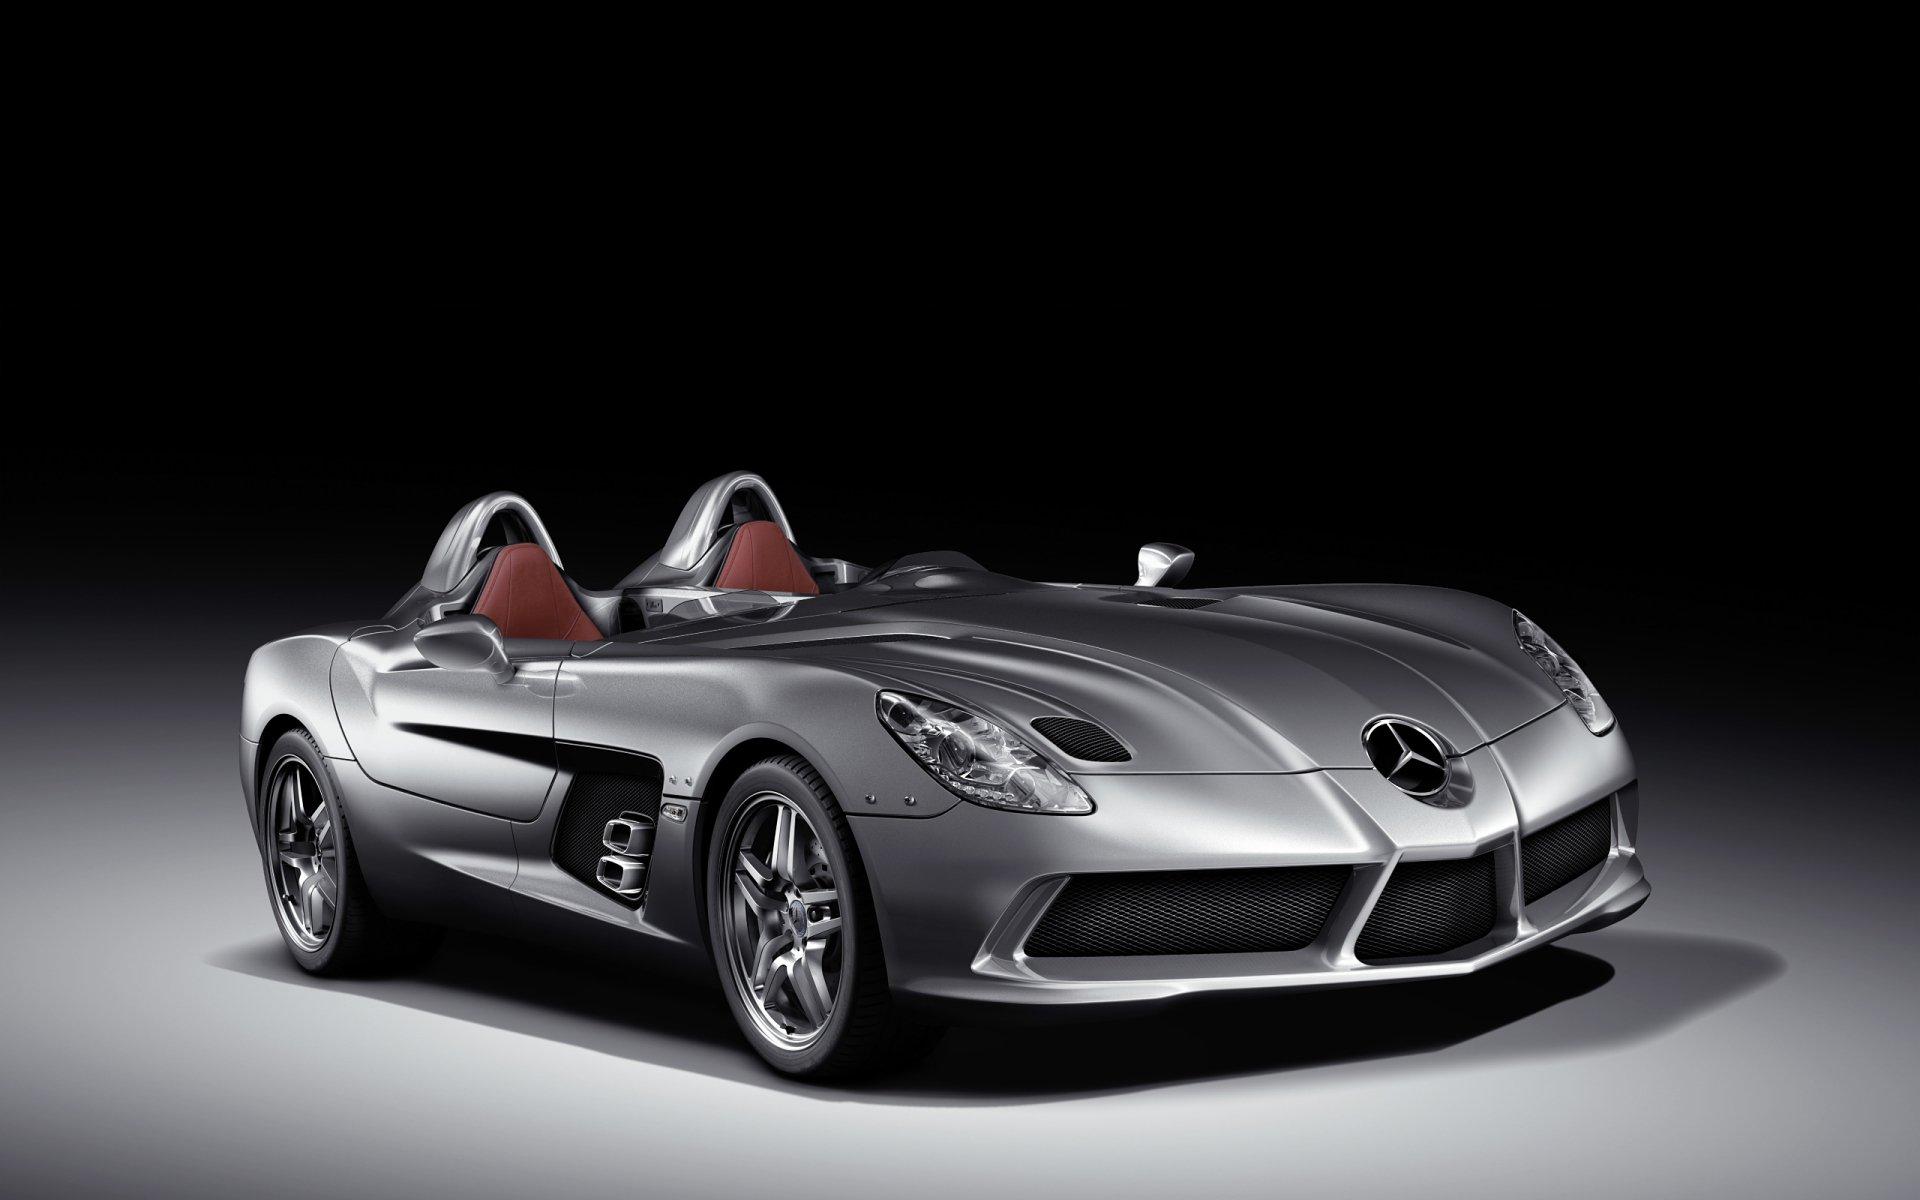 Vehicles - Mercedes-Benz SLR McLaren  Wallpaper